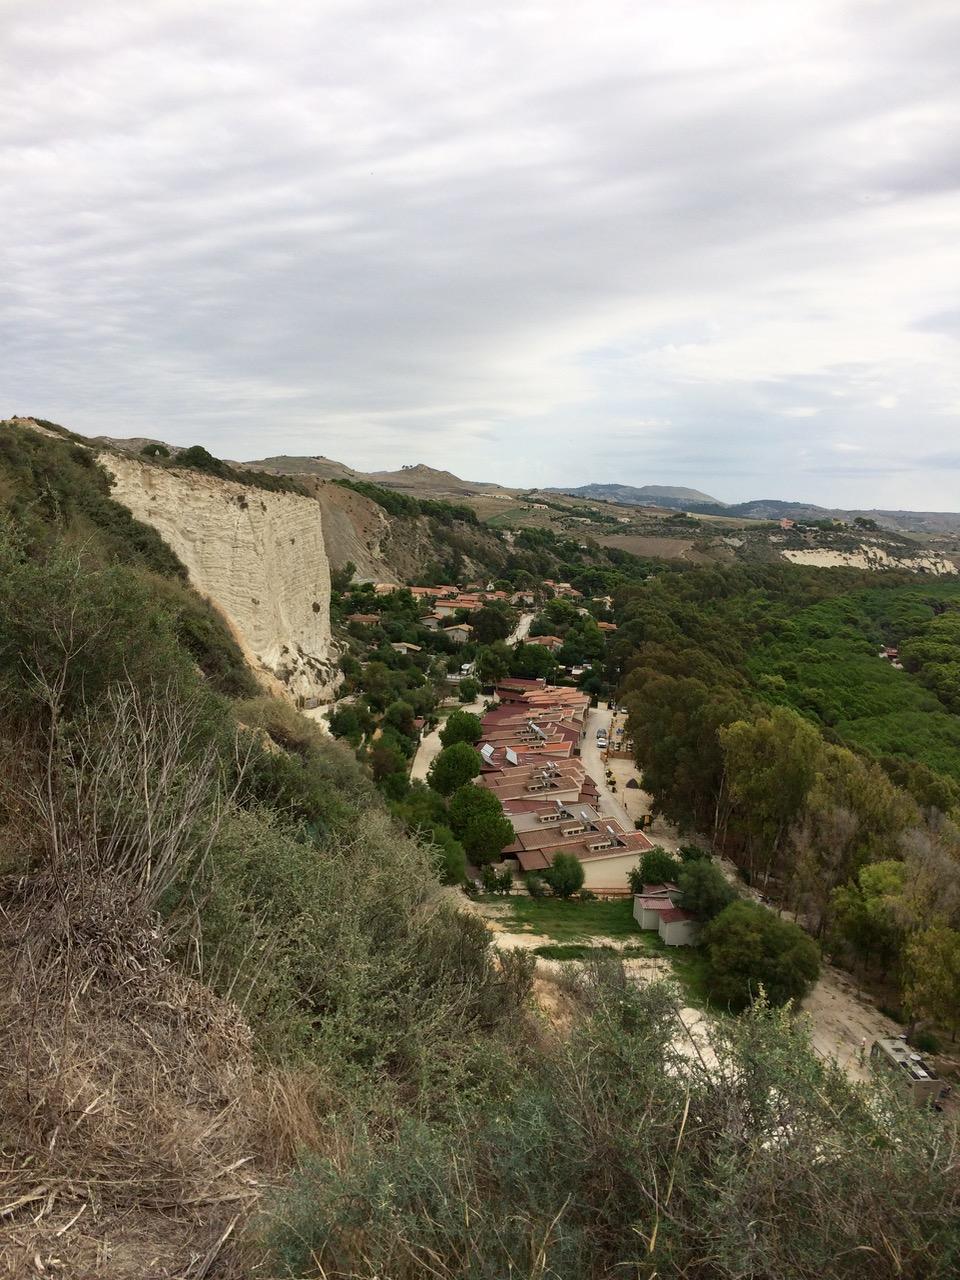 Eraclea Minoa (Cattolica Minoa) village